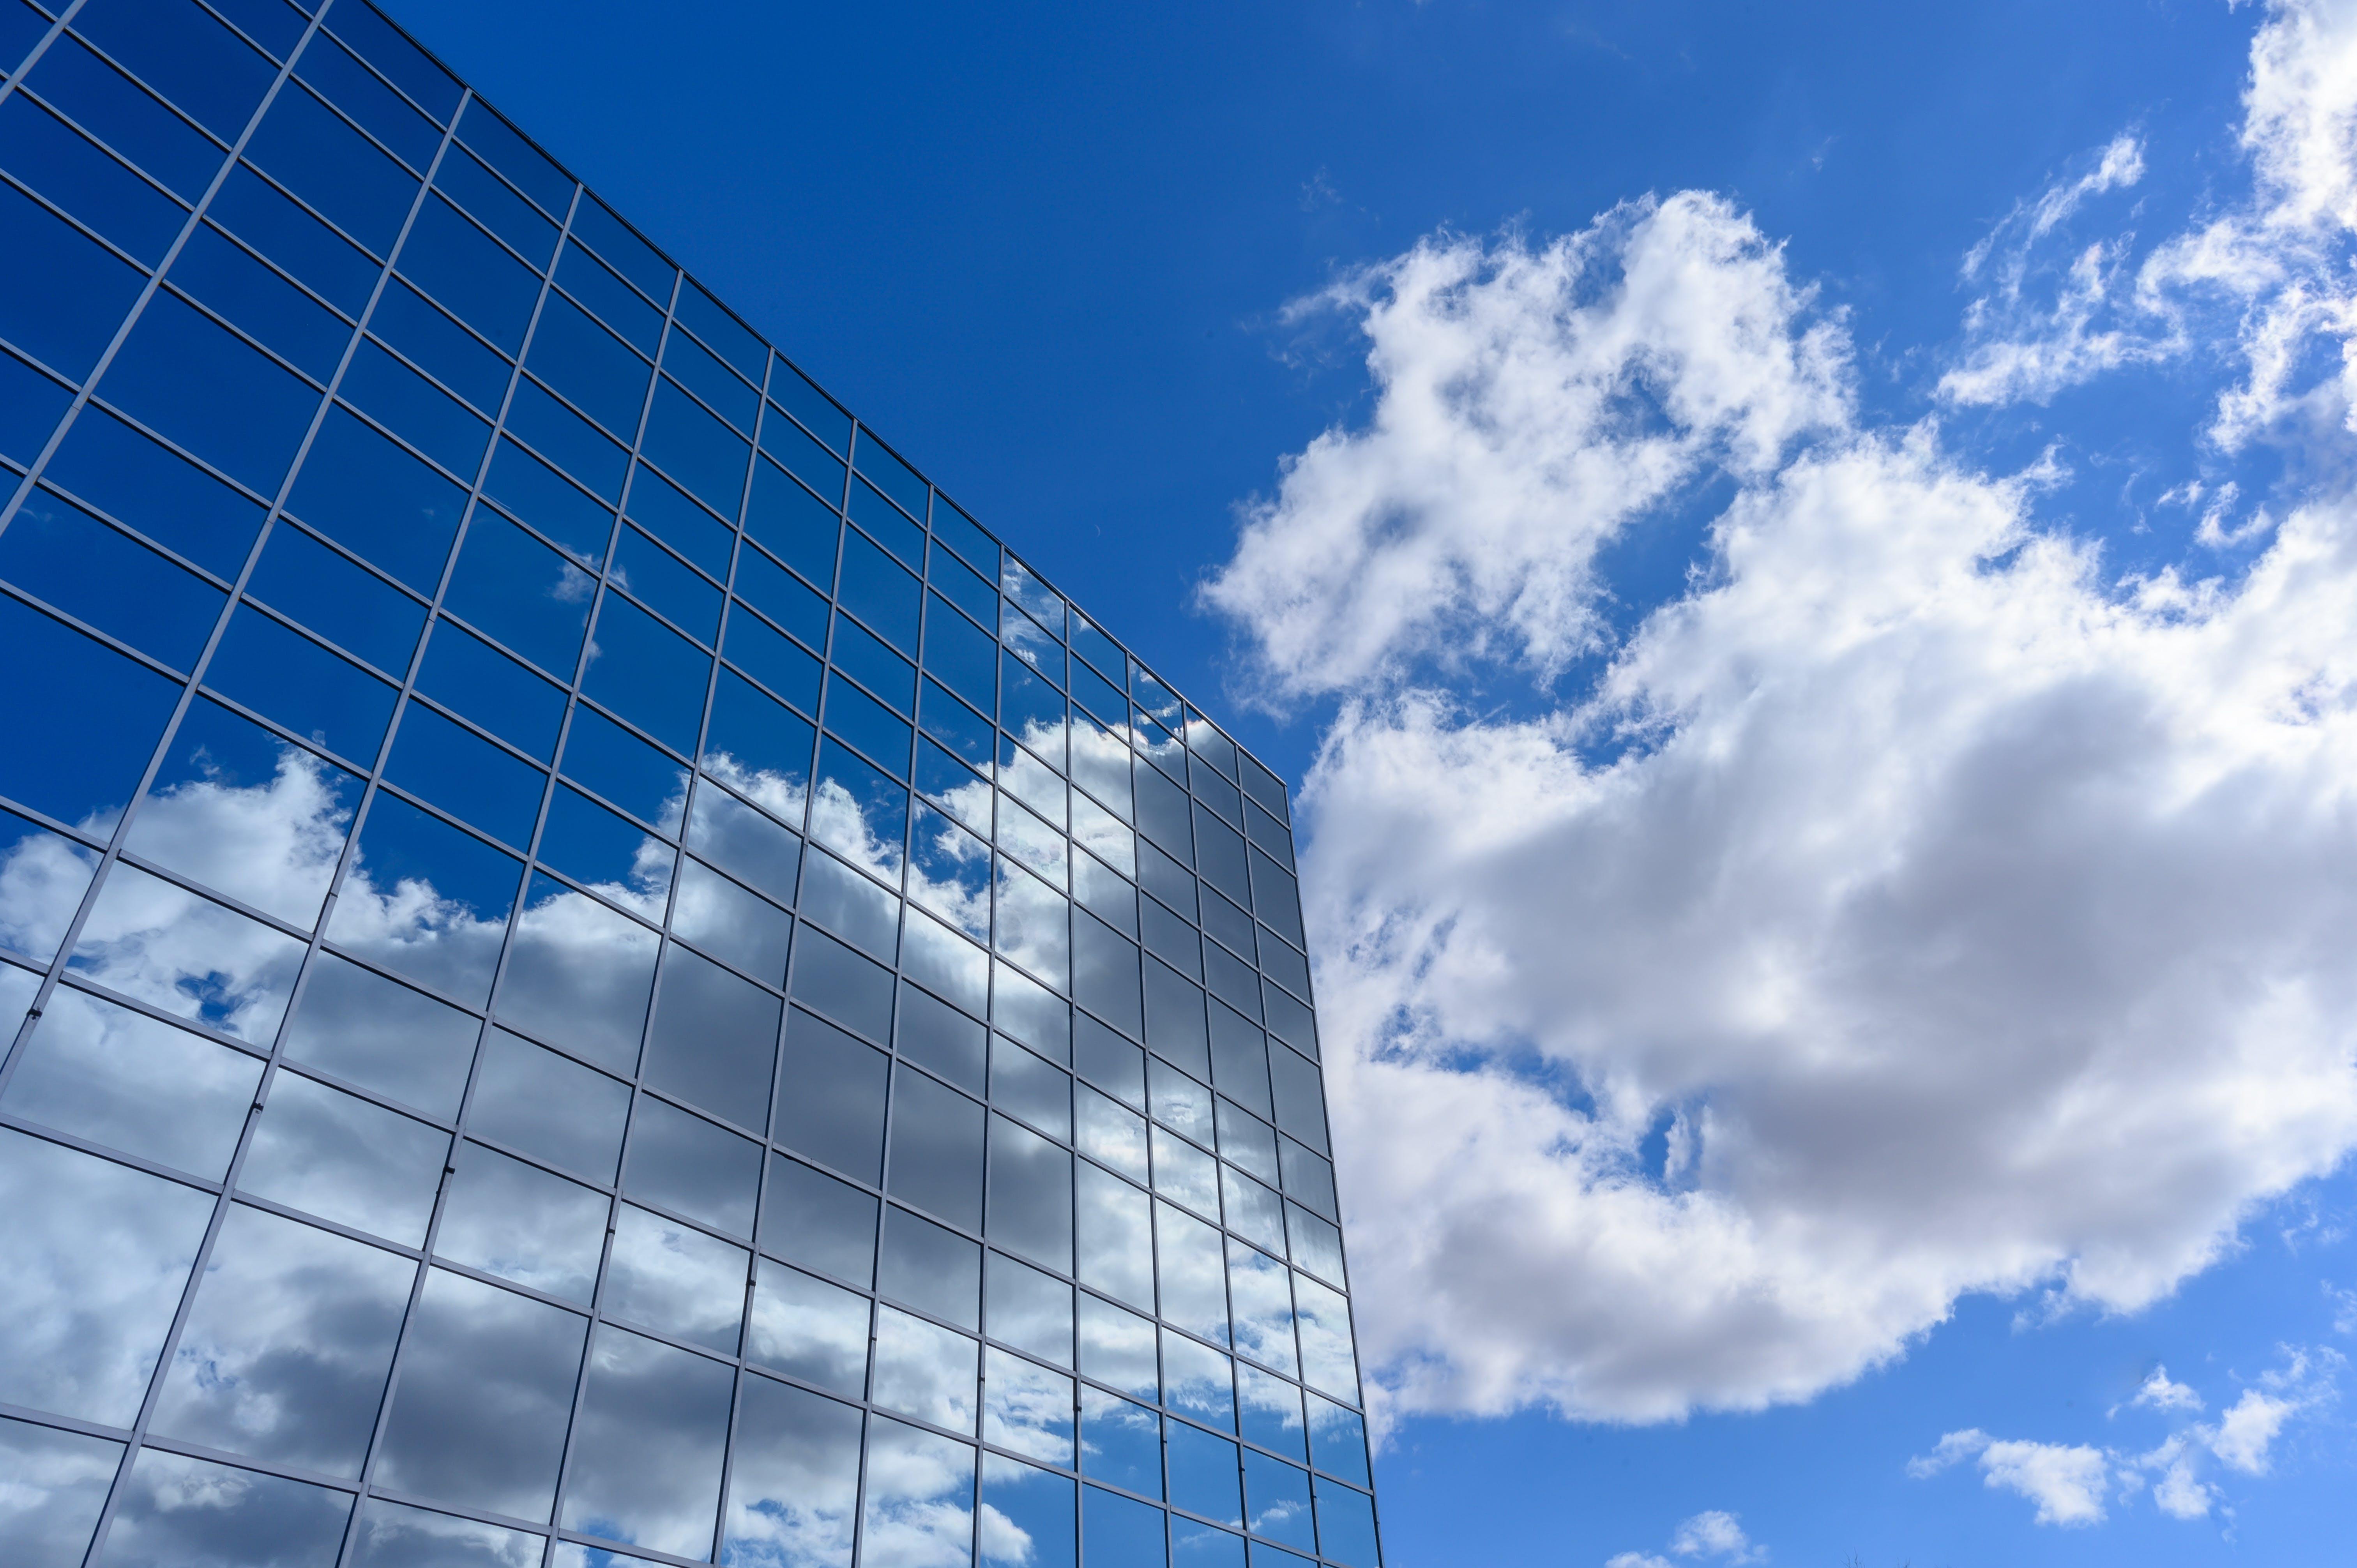 Curtain Wall Building Under Clear Blue Sky